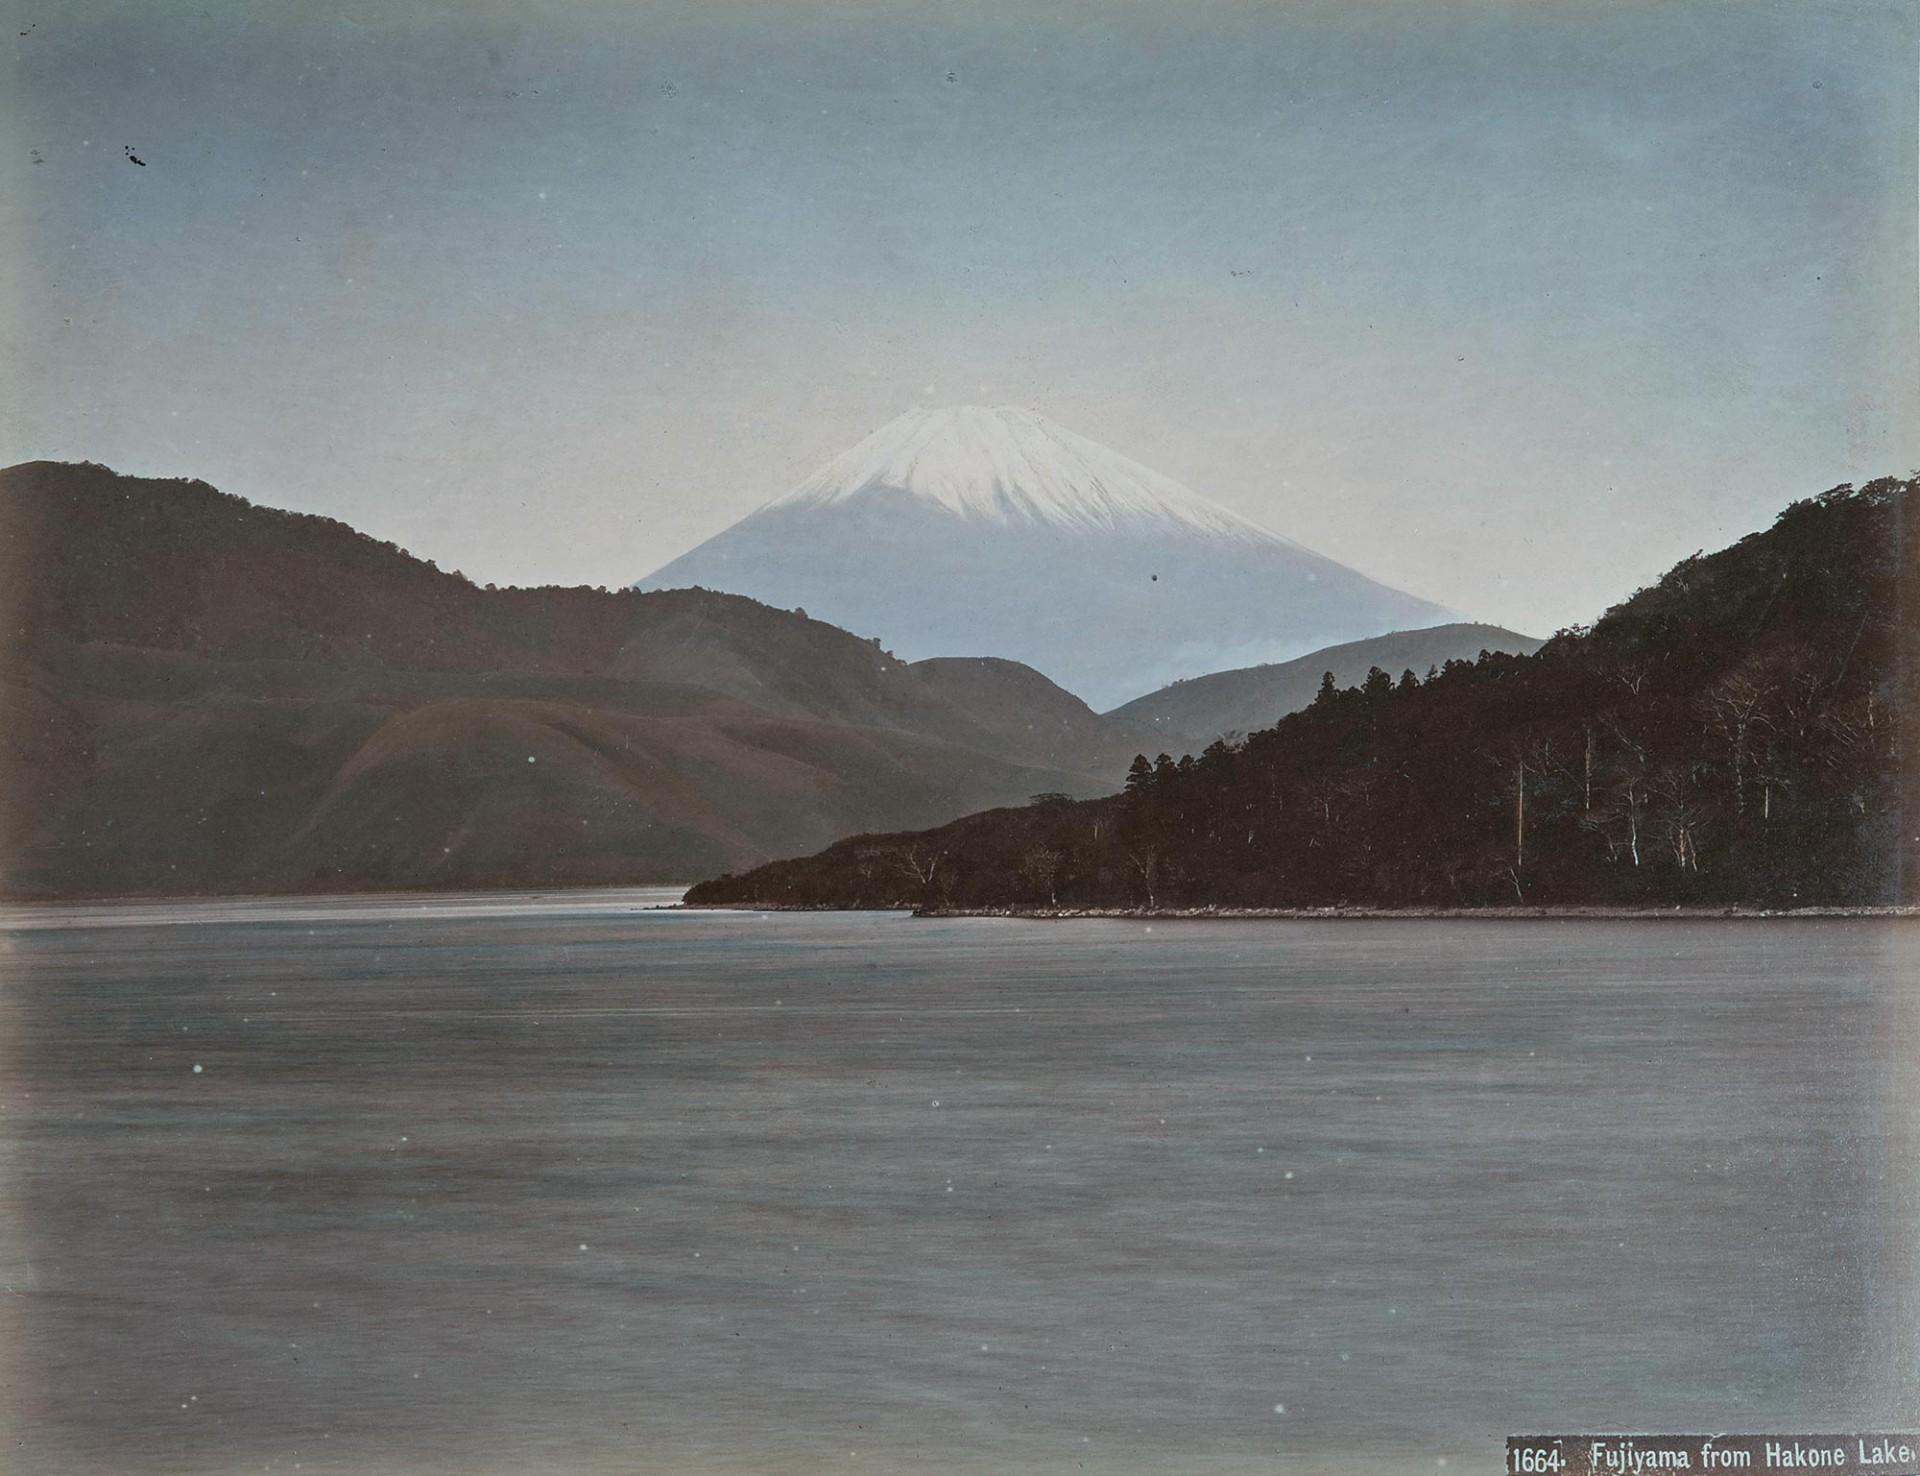 Giappone Segreto  in mostra a Parma  12a7183c6d7